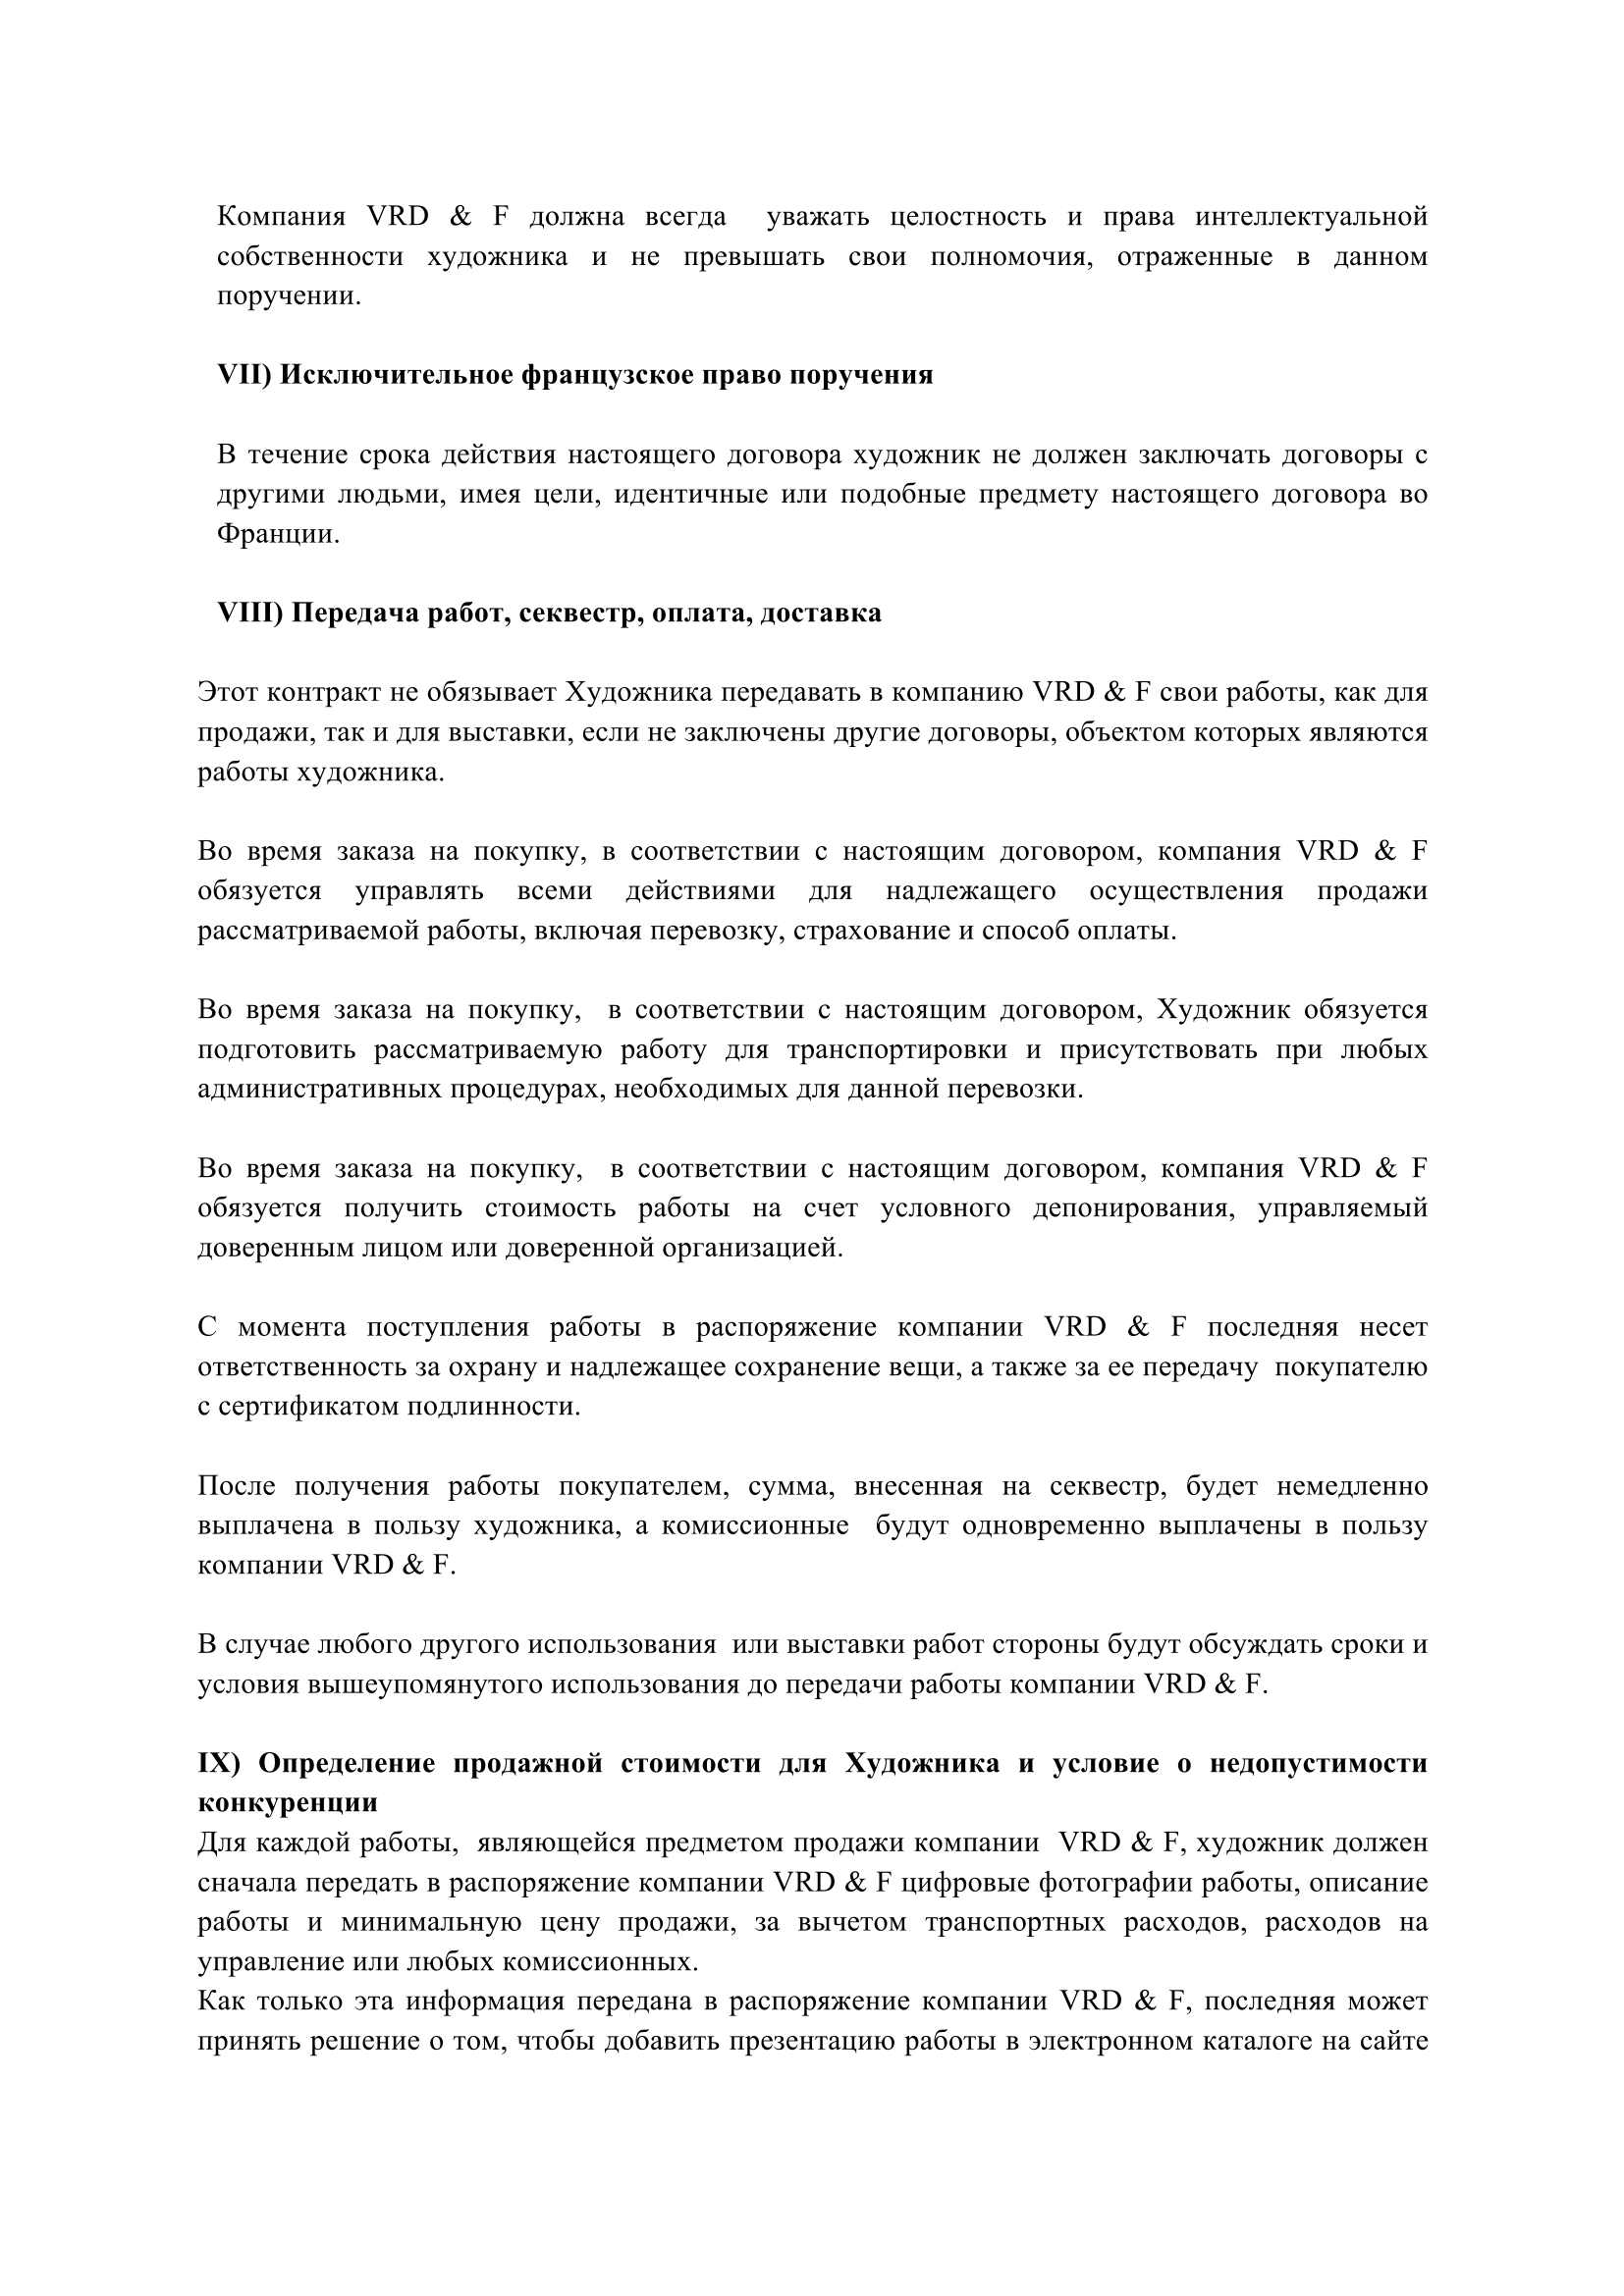 Mandat - Artistes - VRD_F - ру-3